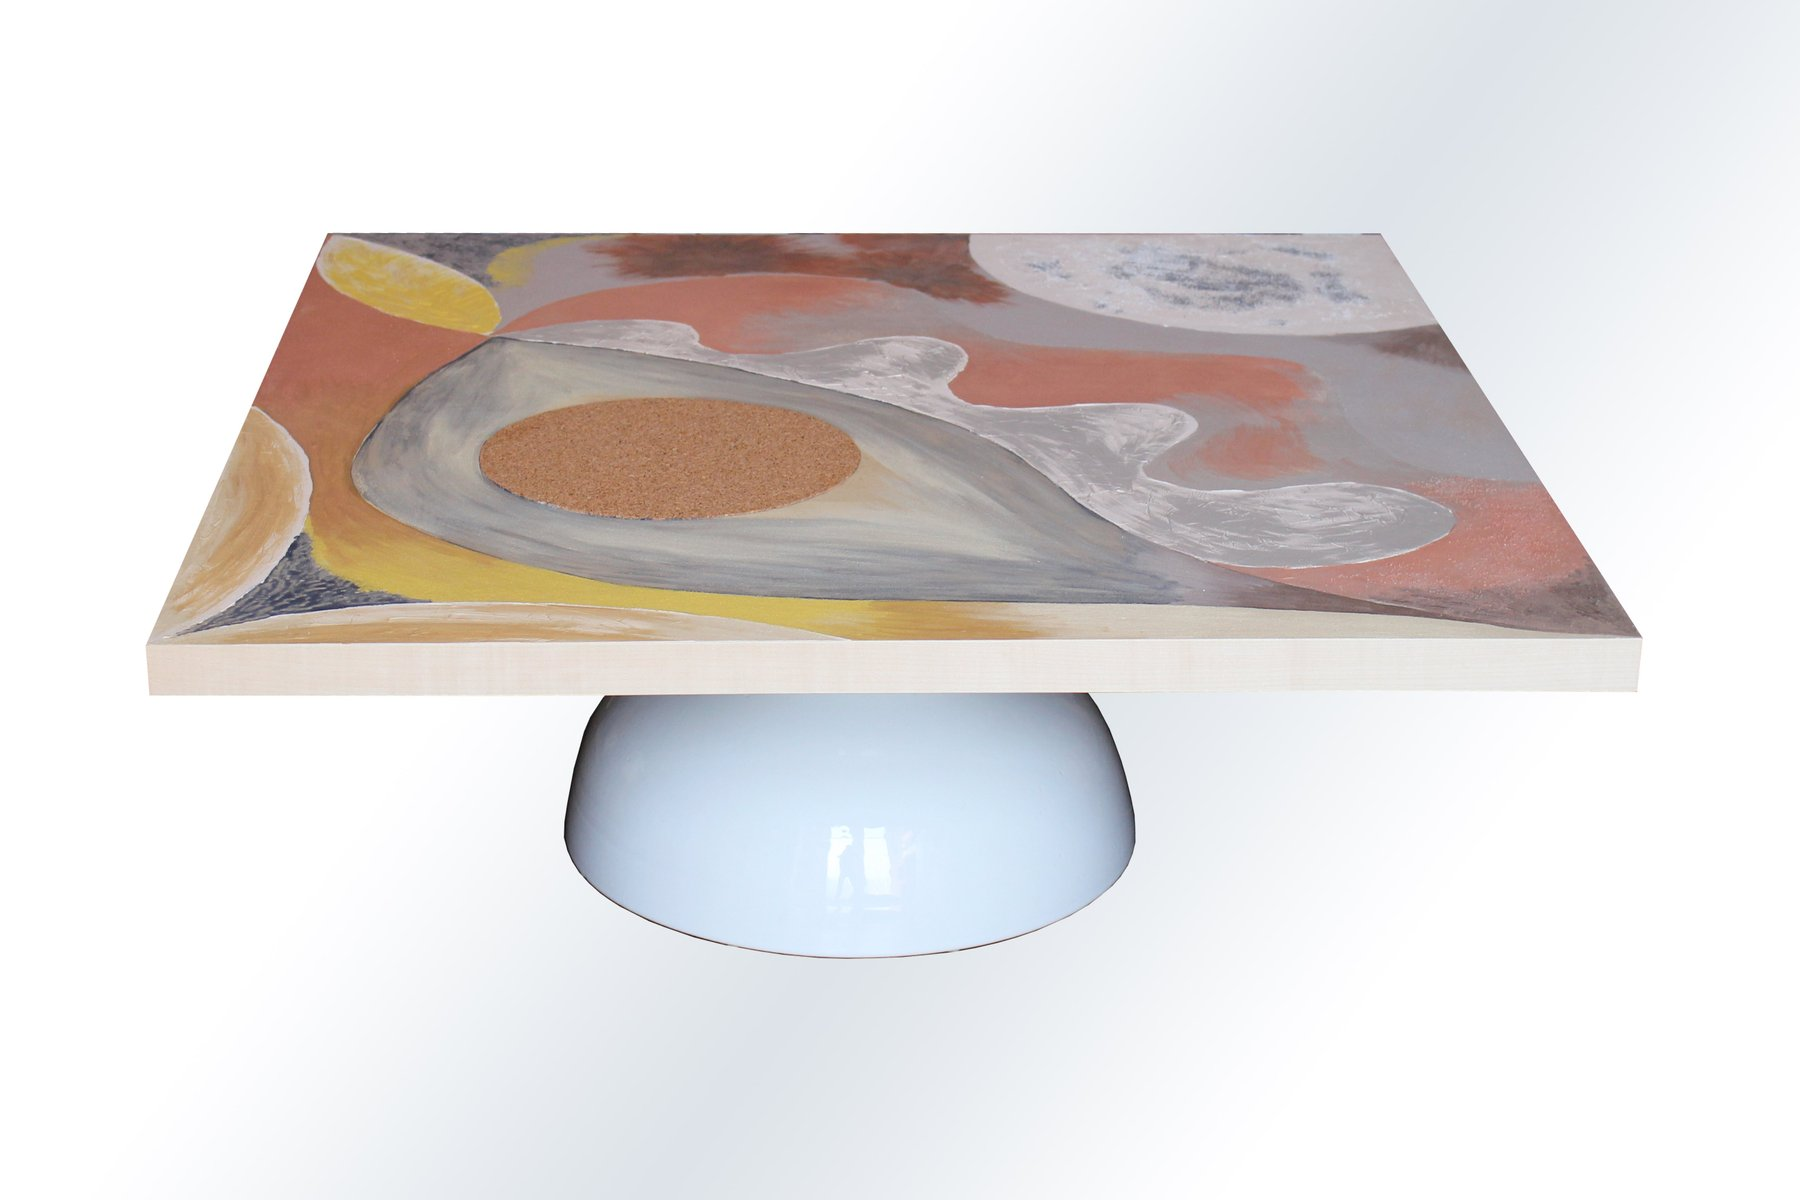 MM1 Couchtisch von Mascia Meccani für Meccani Design